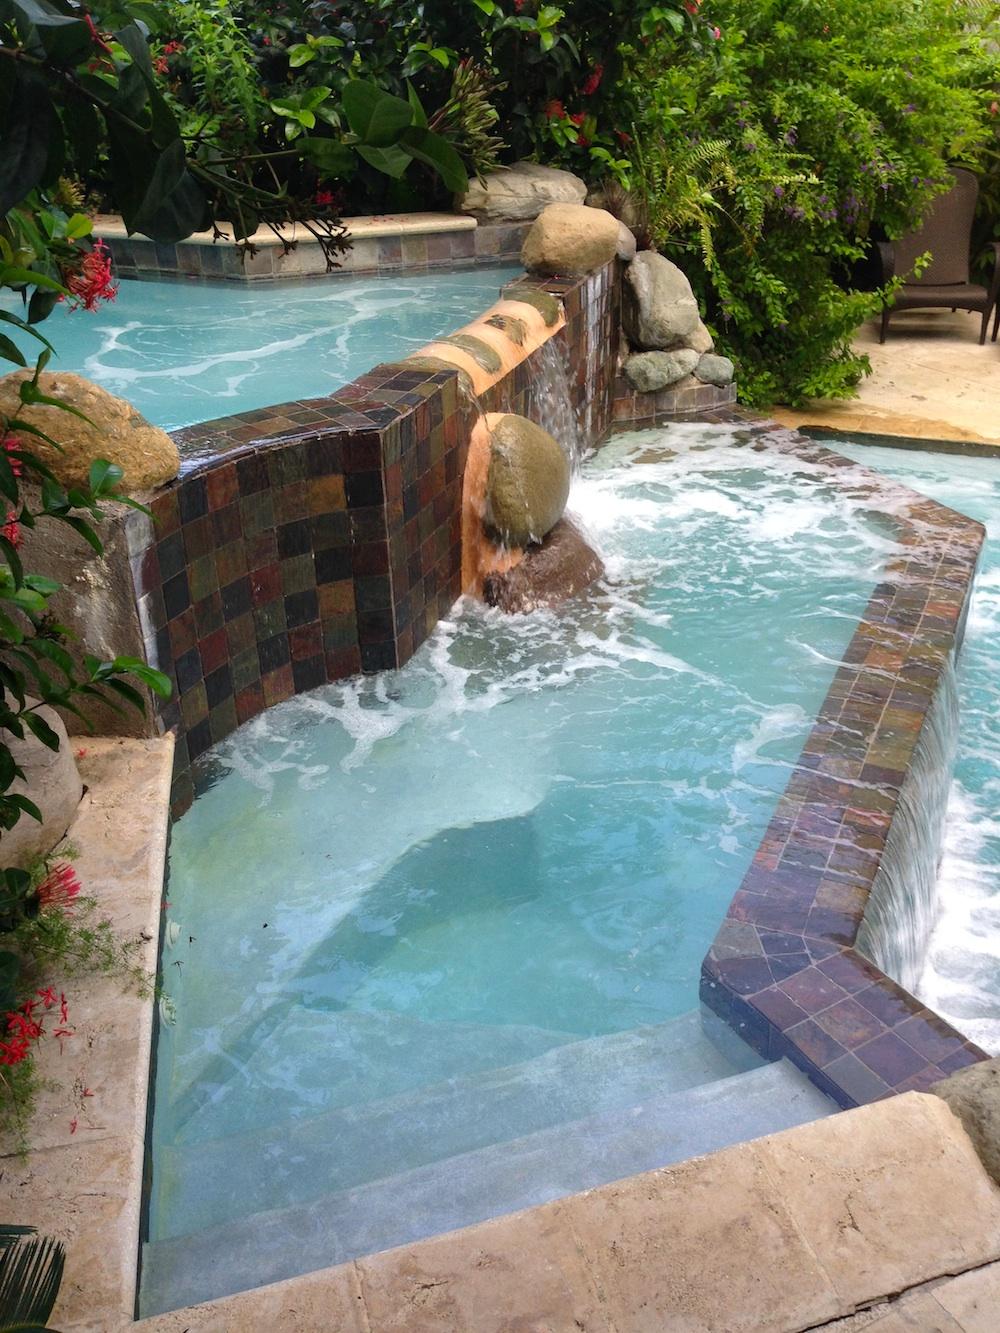 Multi-Level Pool at Half Moon Jamaica / see more at www.BrendasWeddingBlog.com